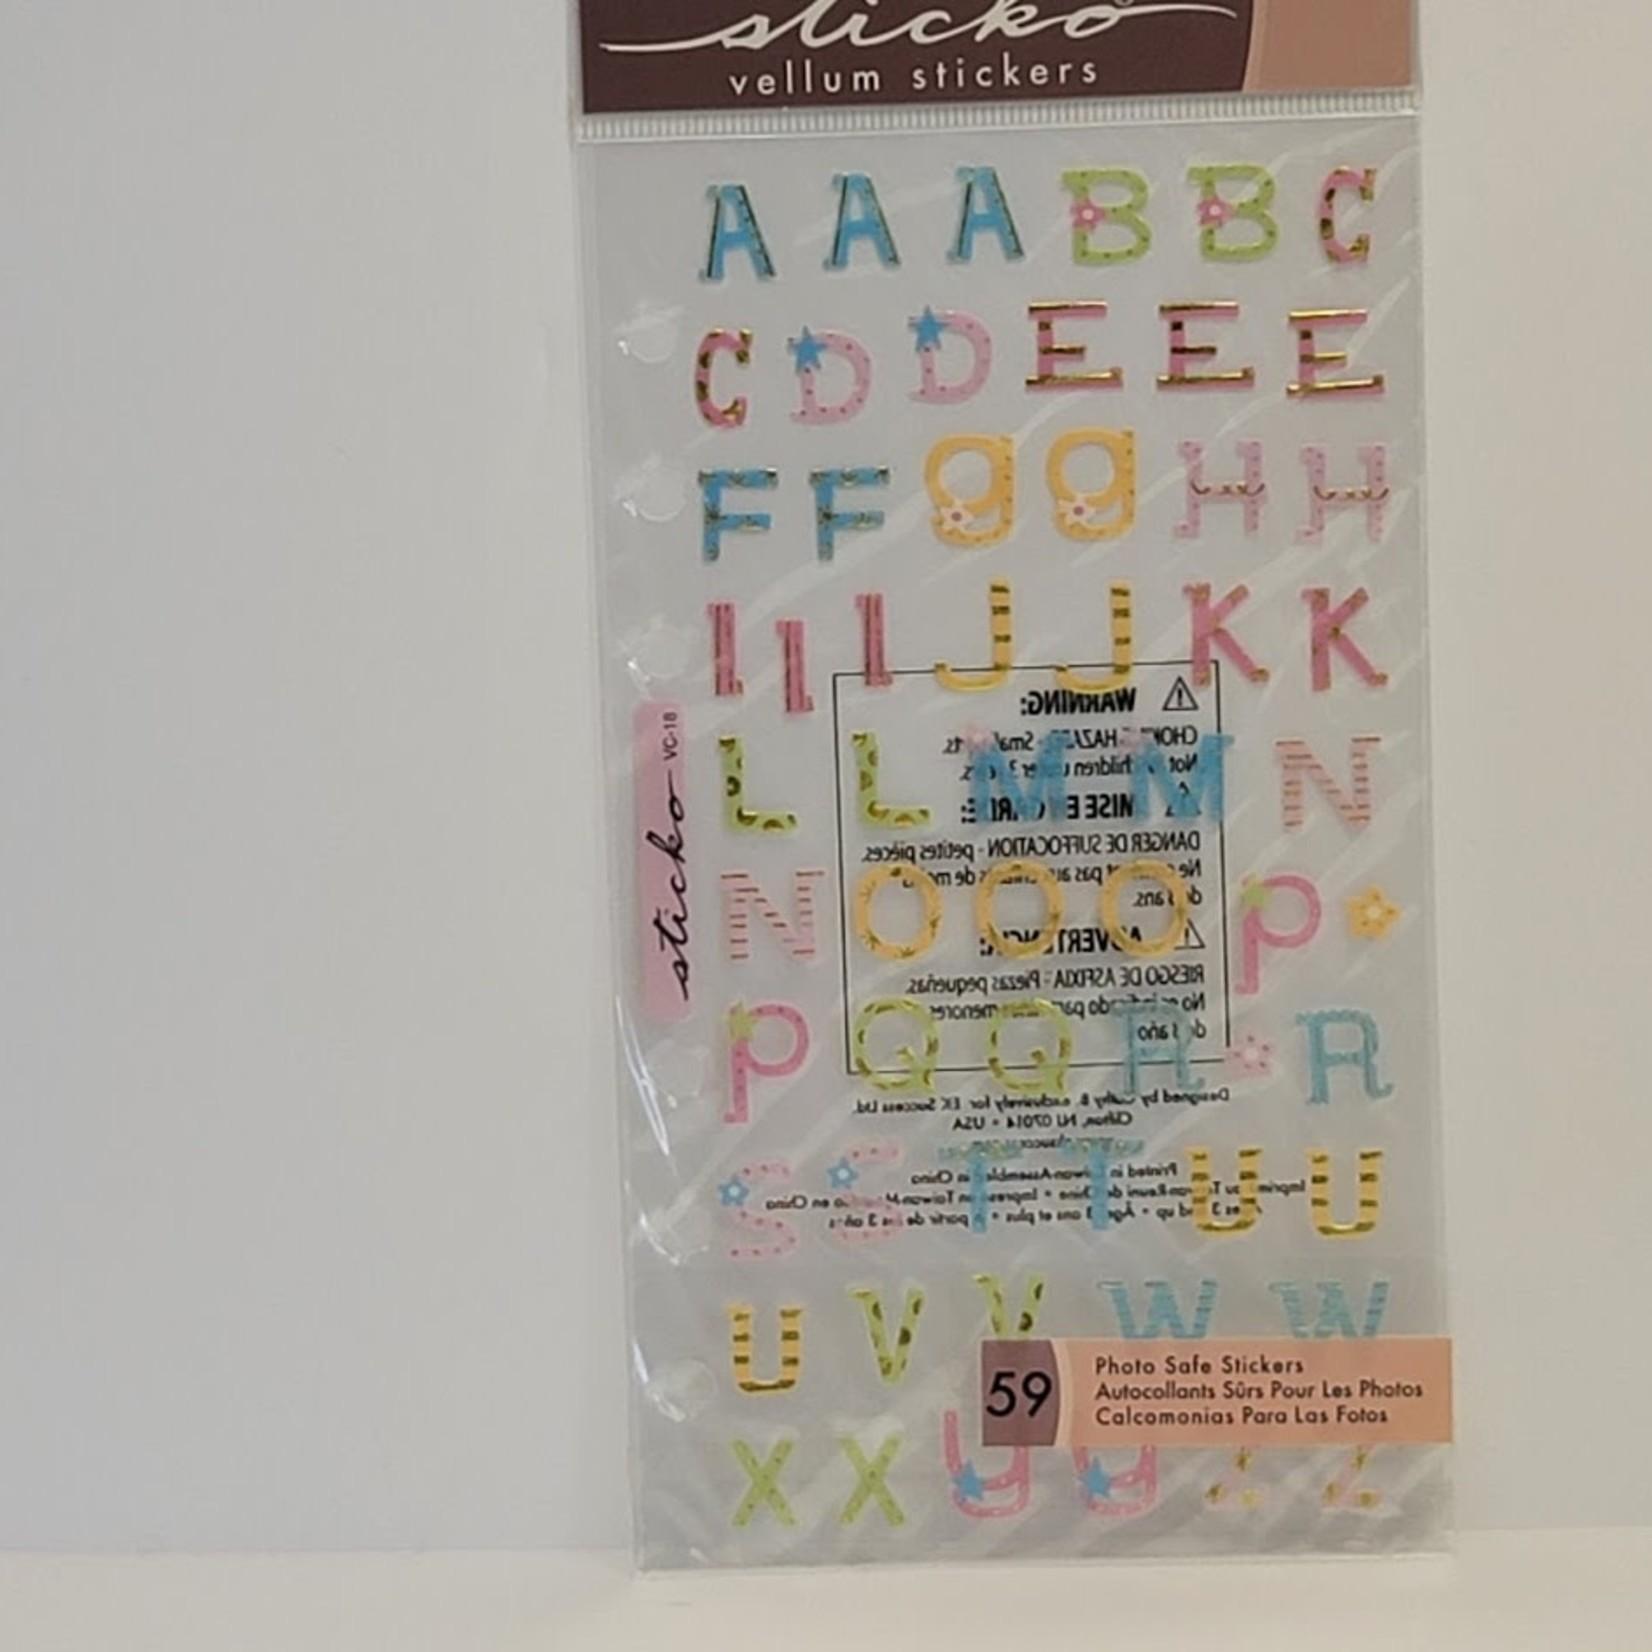 Sticko - Vellum Stickers - Adorable ABC Upper